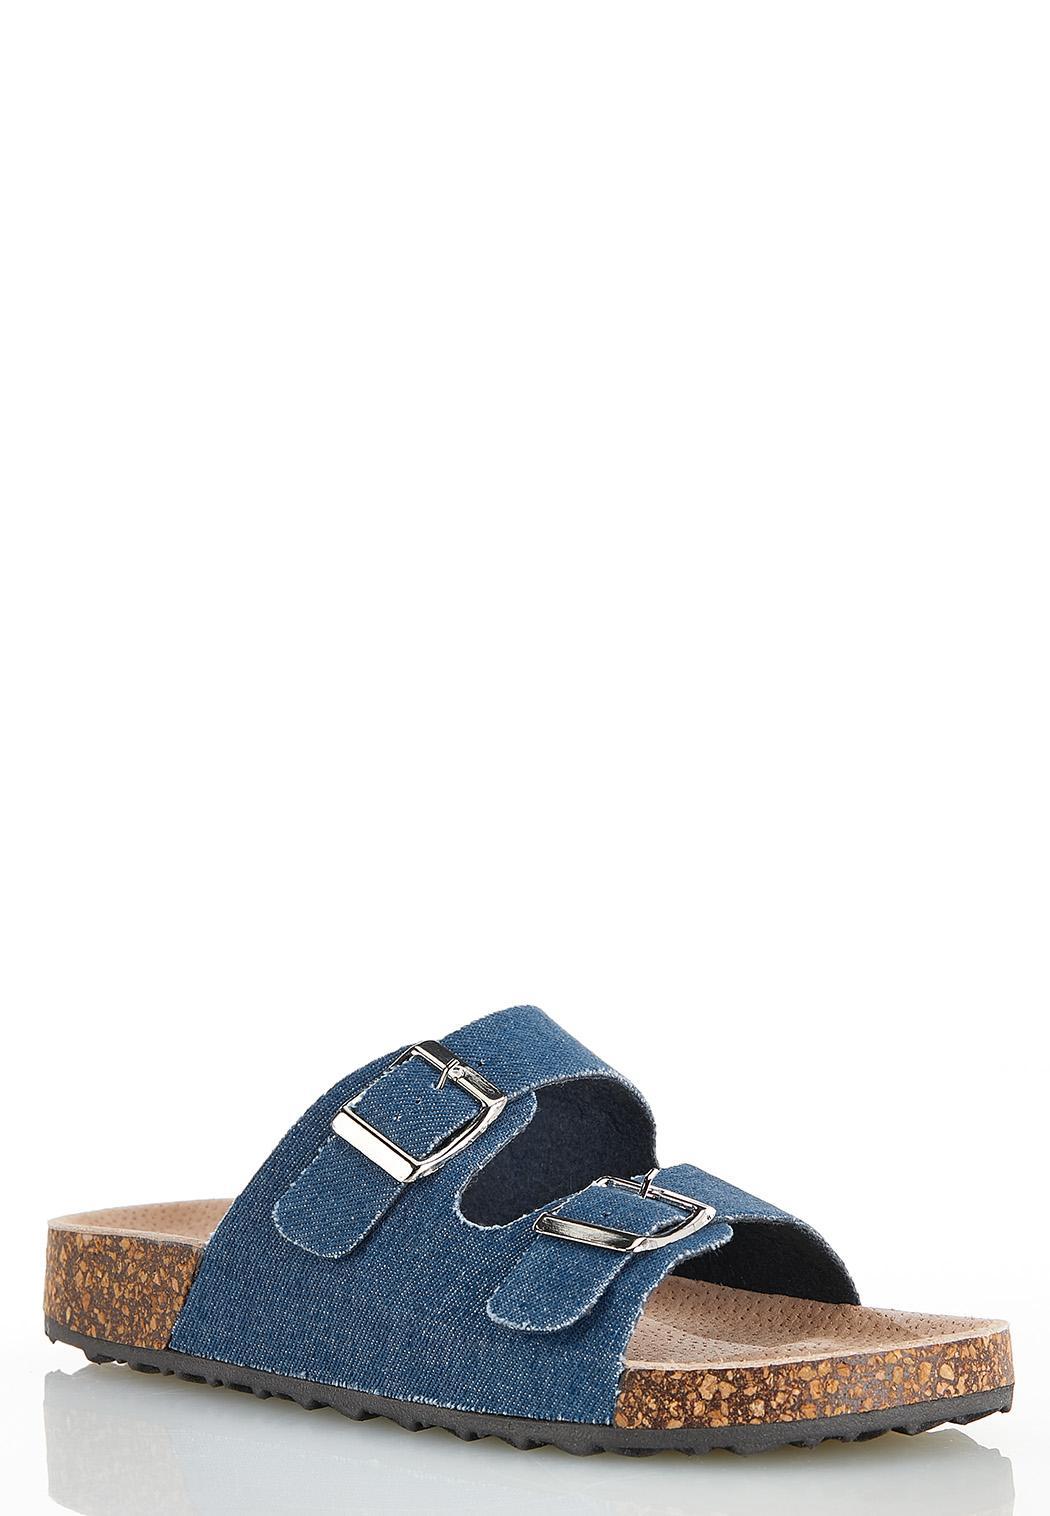 Double Buckle Denim Sandals